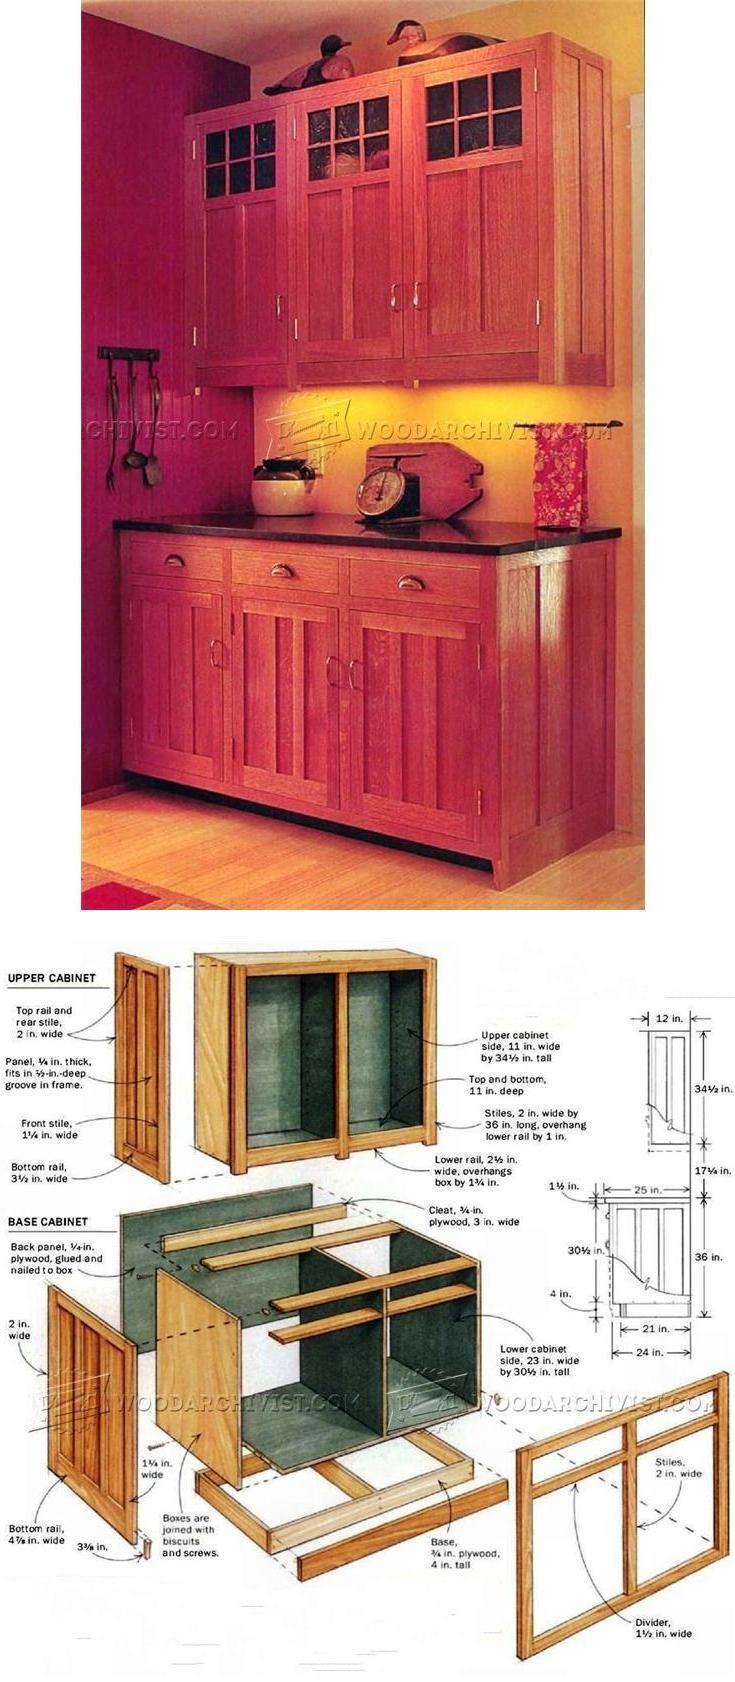 Best Kitchen Gallery: 589 Best Cabi Ry Images On Pinterest Woodworking Diy Cabi S of Kitchen Cabinet Box Plans on rachelxblog.com